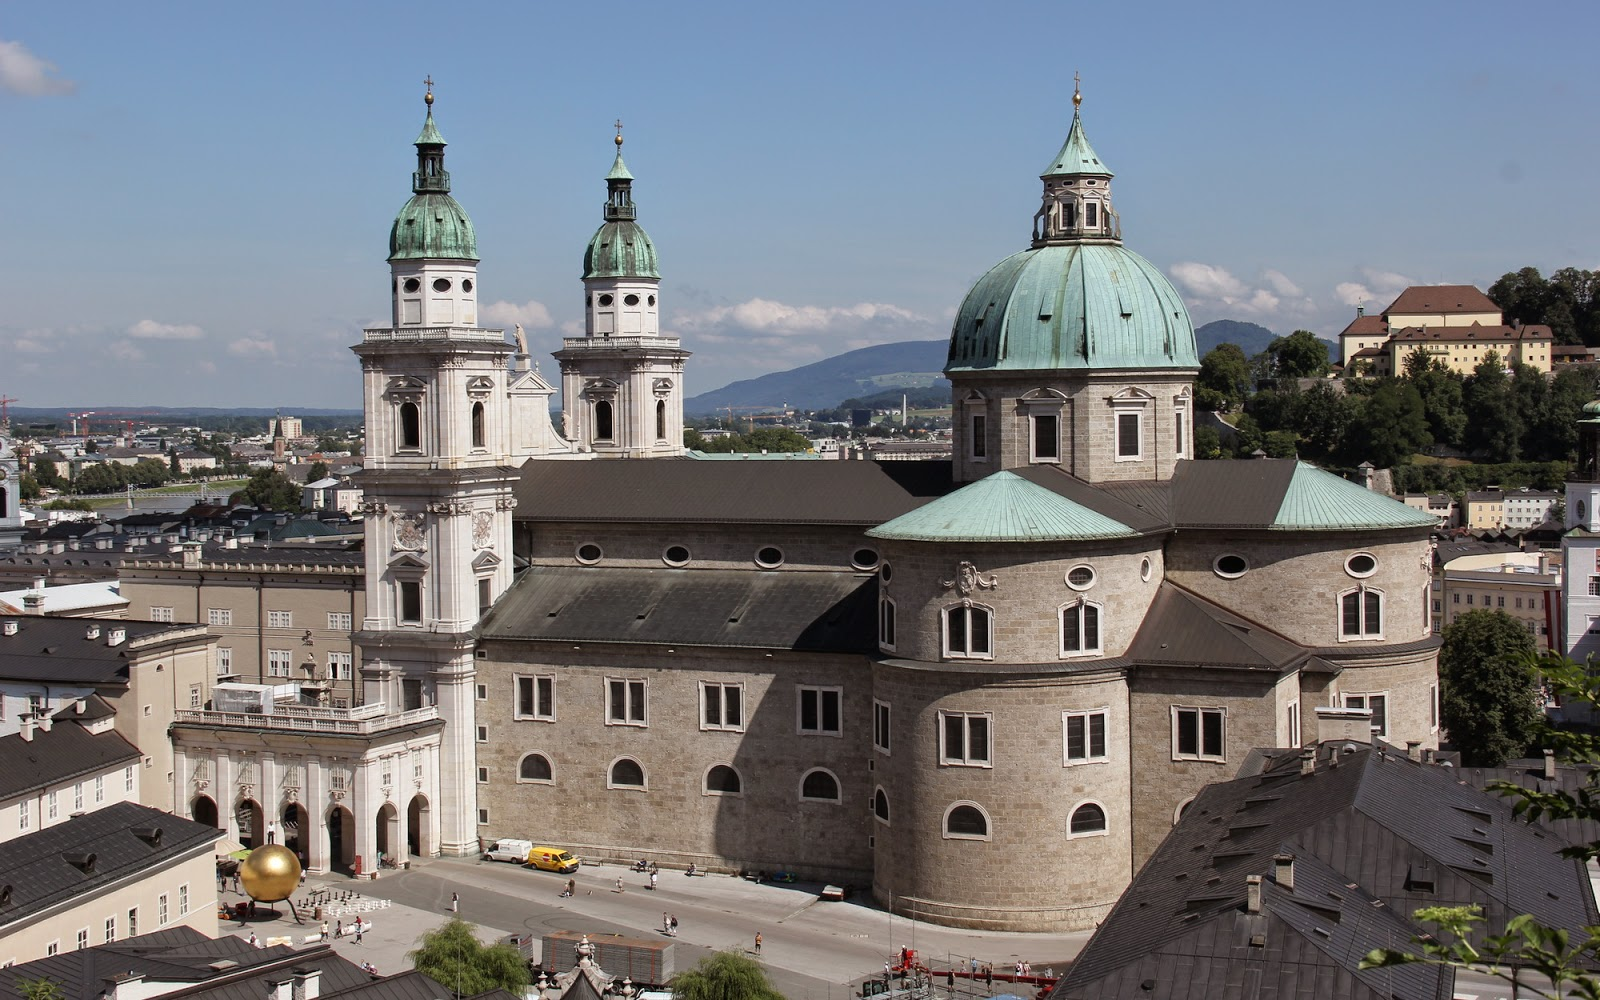 Salzburg.De